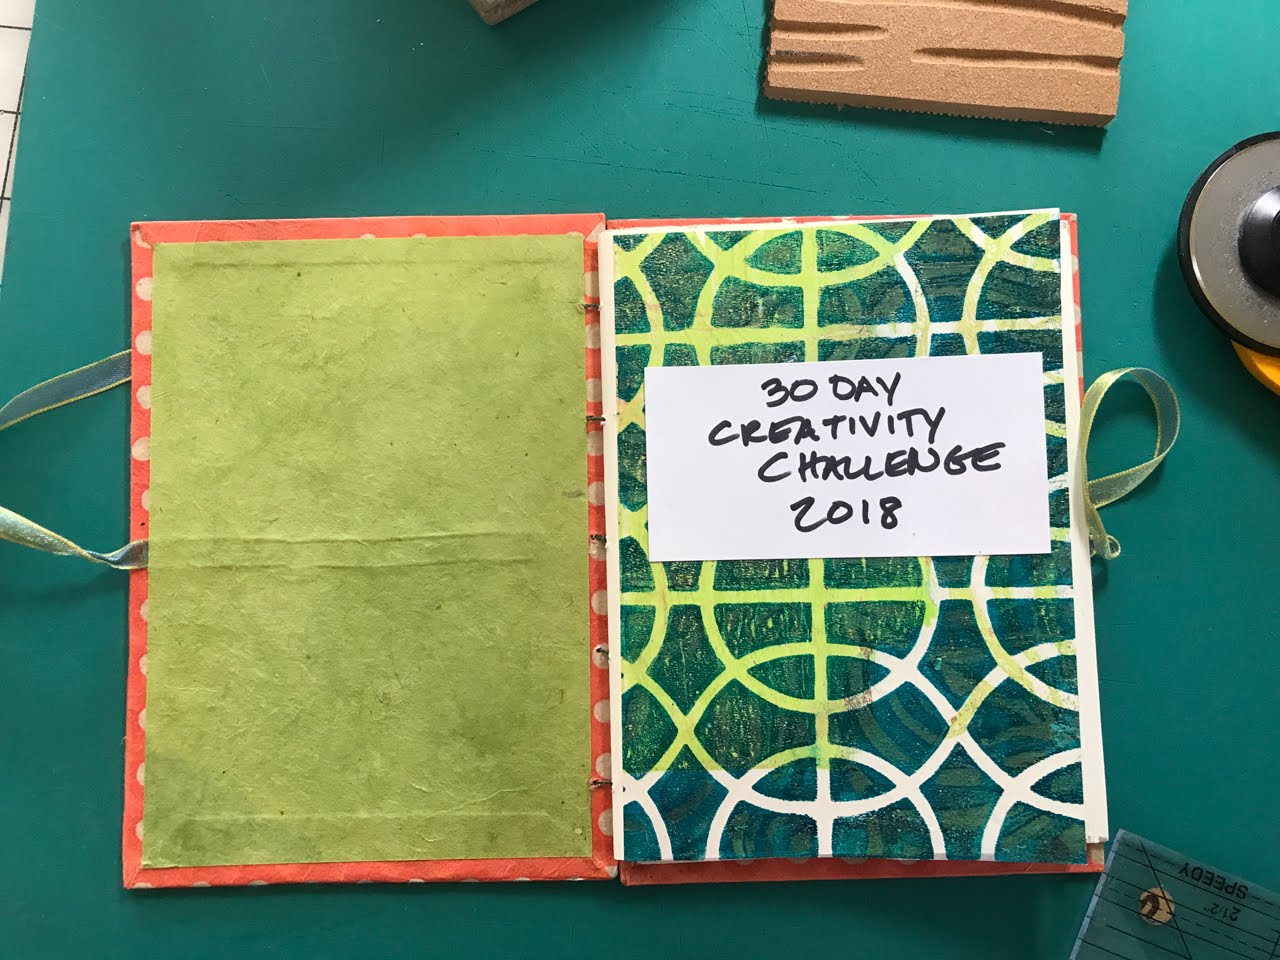 30 Day Creative Challenge!